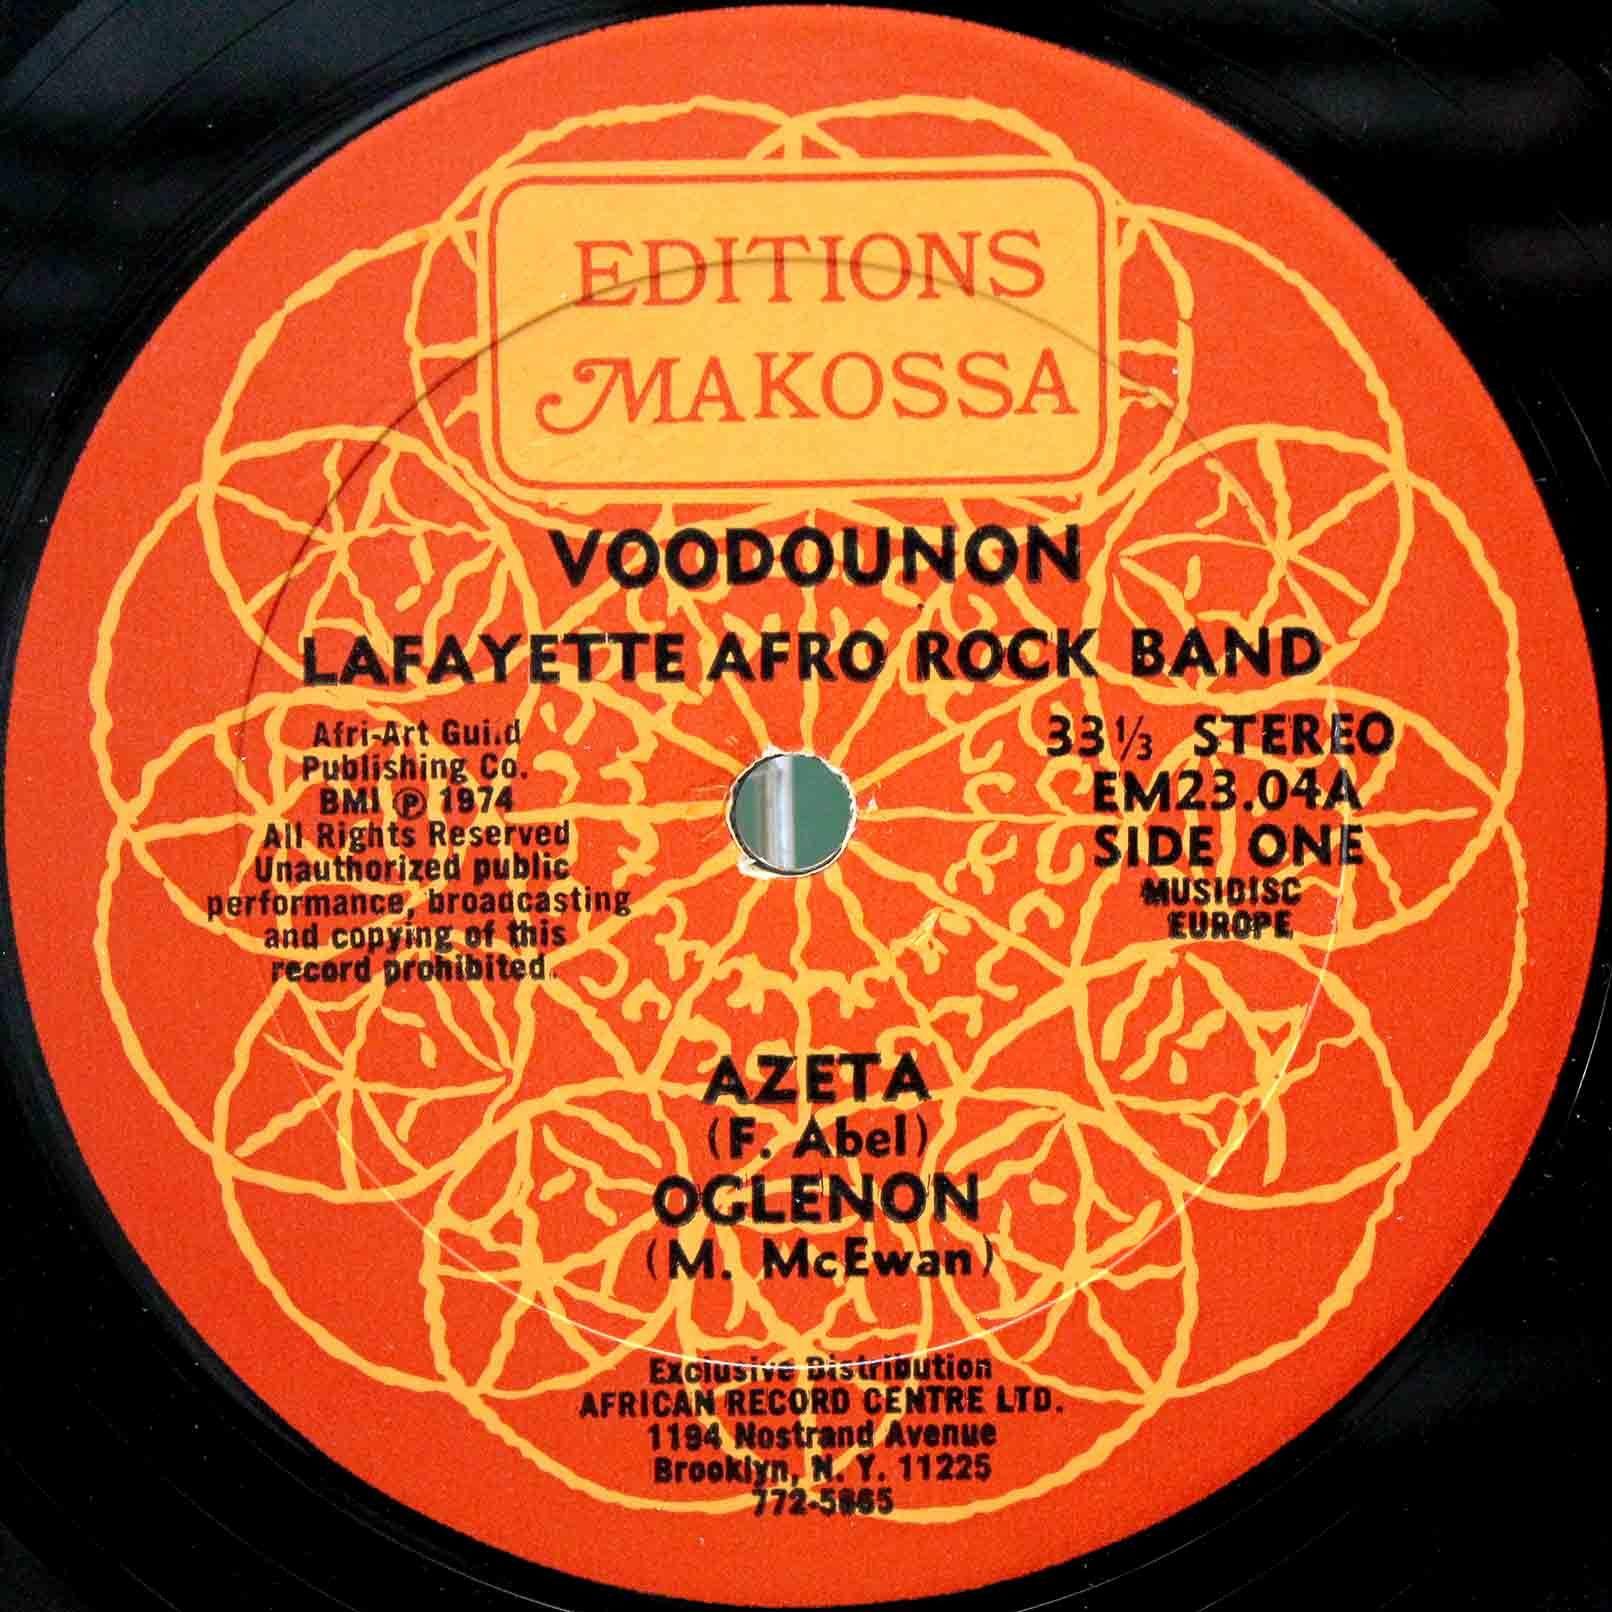 Lafayette Afro Rock Band – Voodounon 03